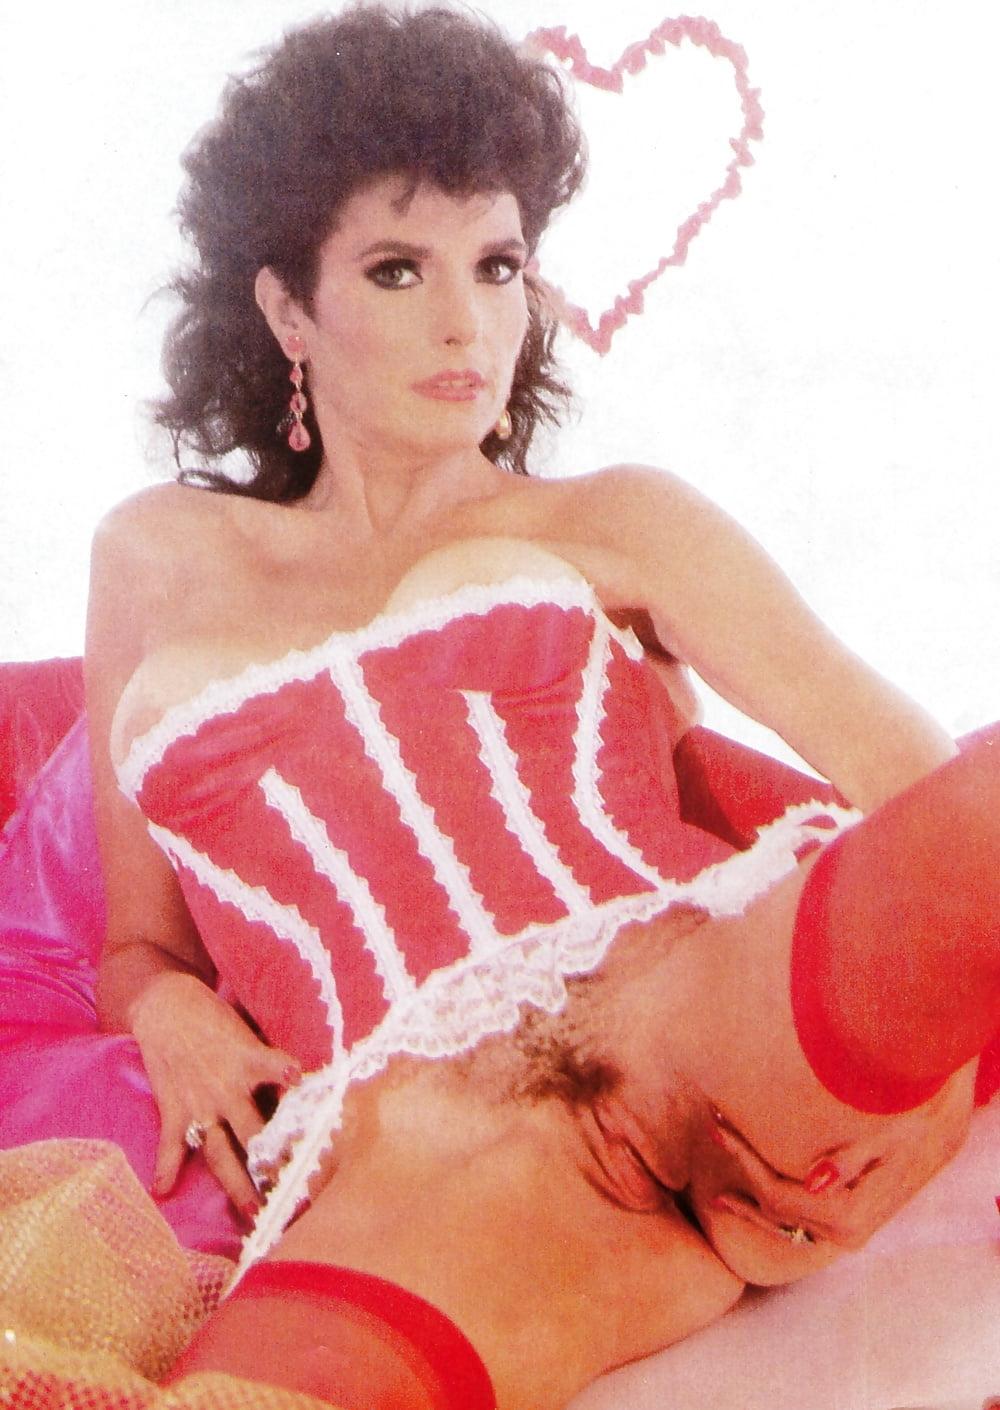 girls-ecstasy-naked-pictures-of-gloria-leonard-naked-women-getting